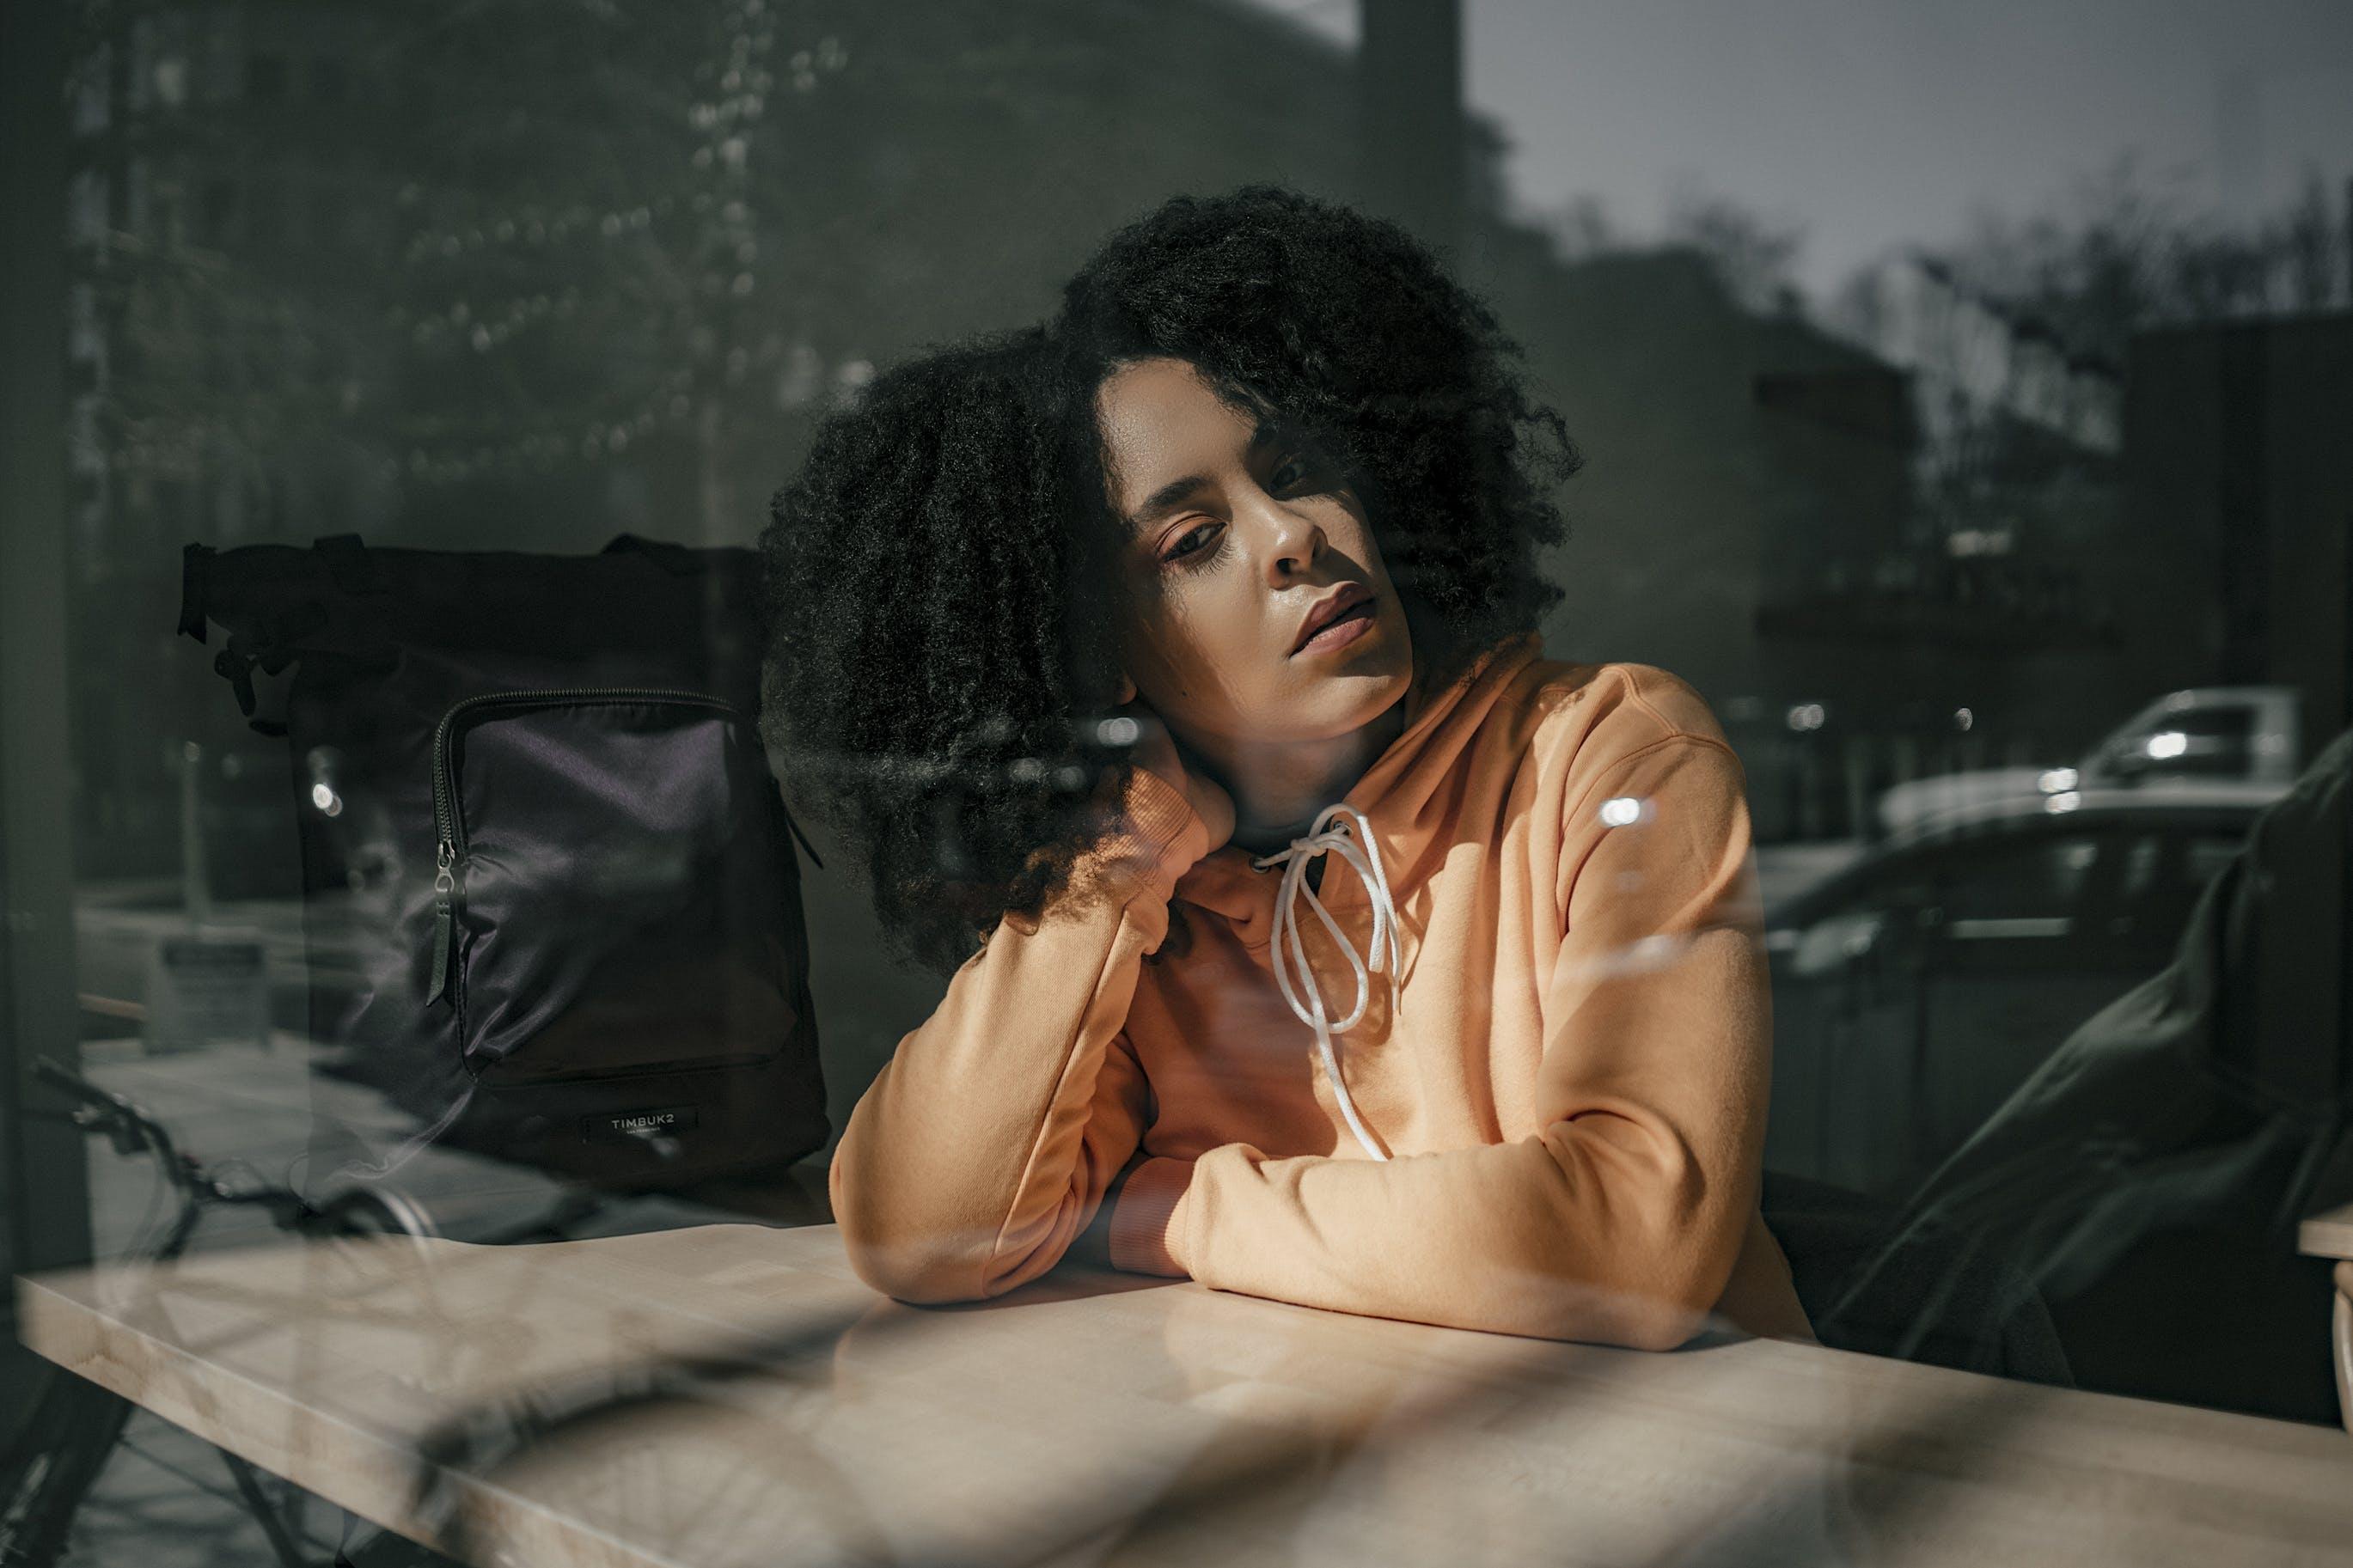 Woman Wearing Hoodie Leaning on Desk